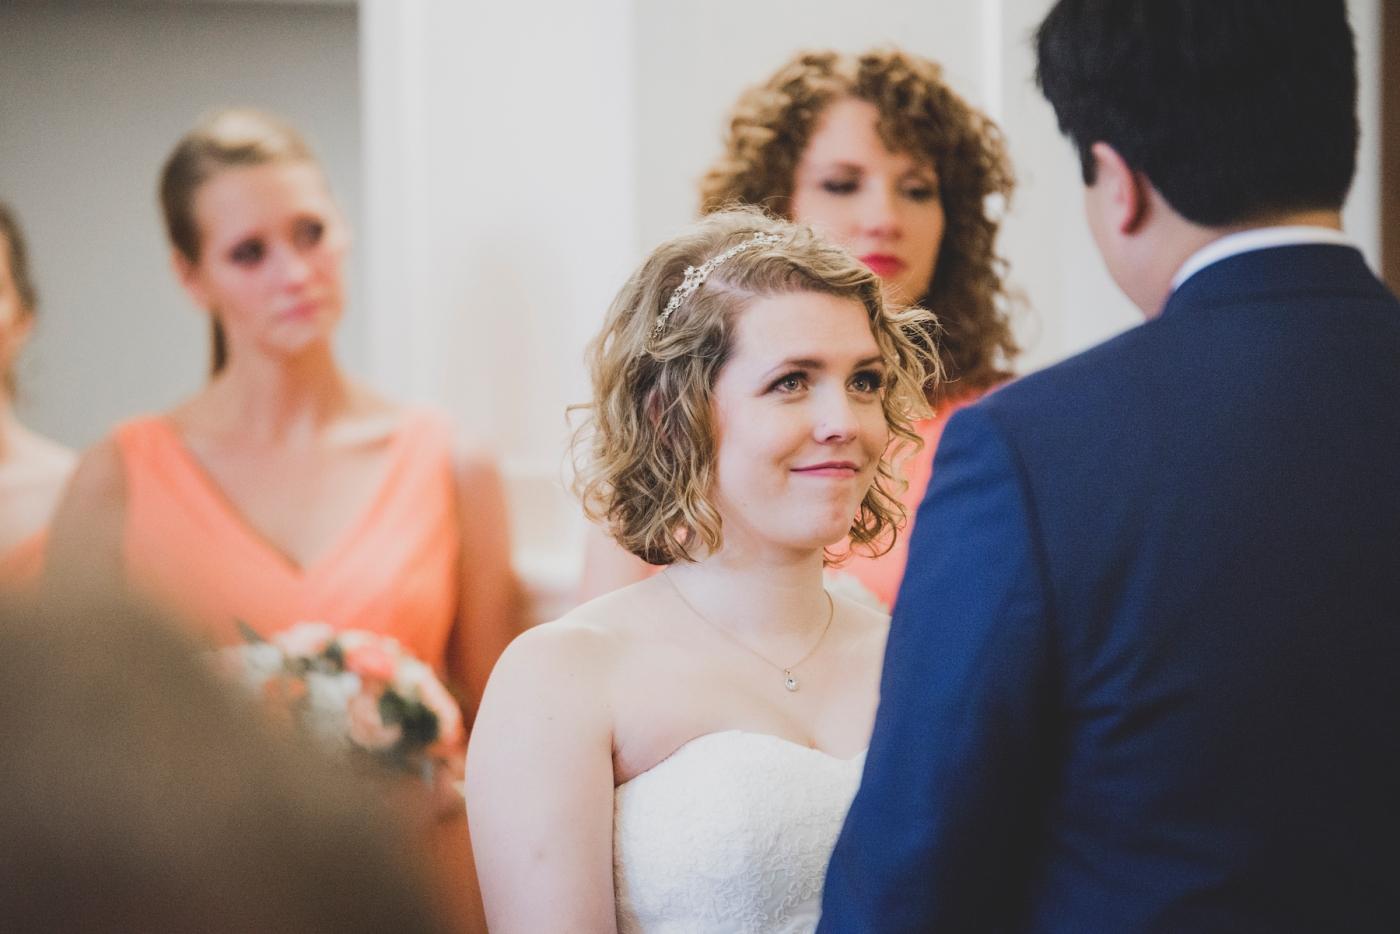 DSC_2630Everett_Wedding_Ballroom_Jane_Speleers_photography_Rachel_and_Edmund_Ceremony_2017